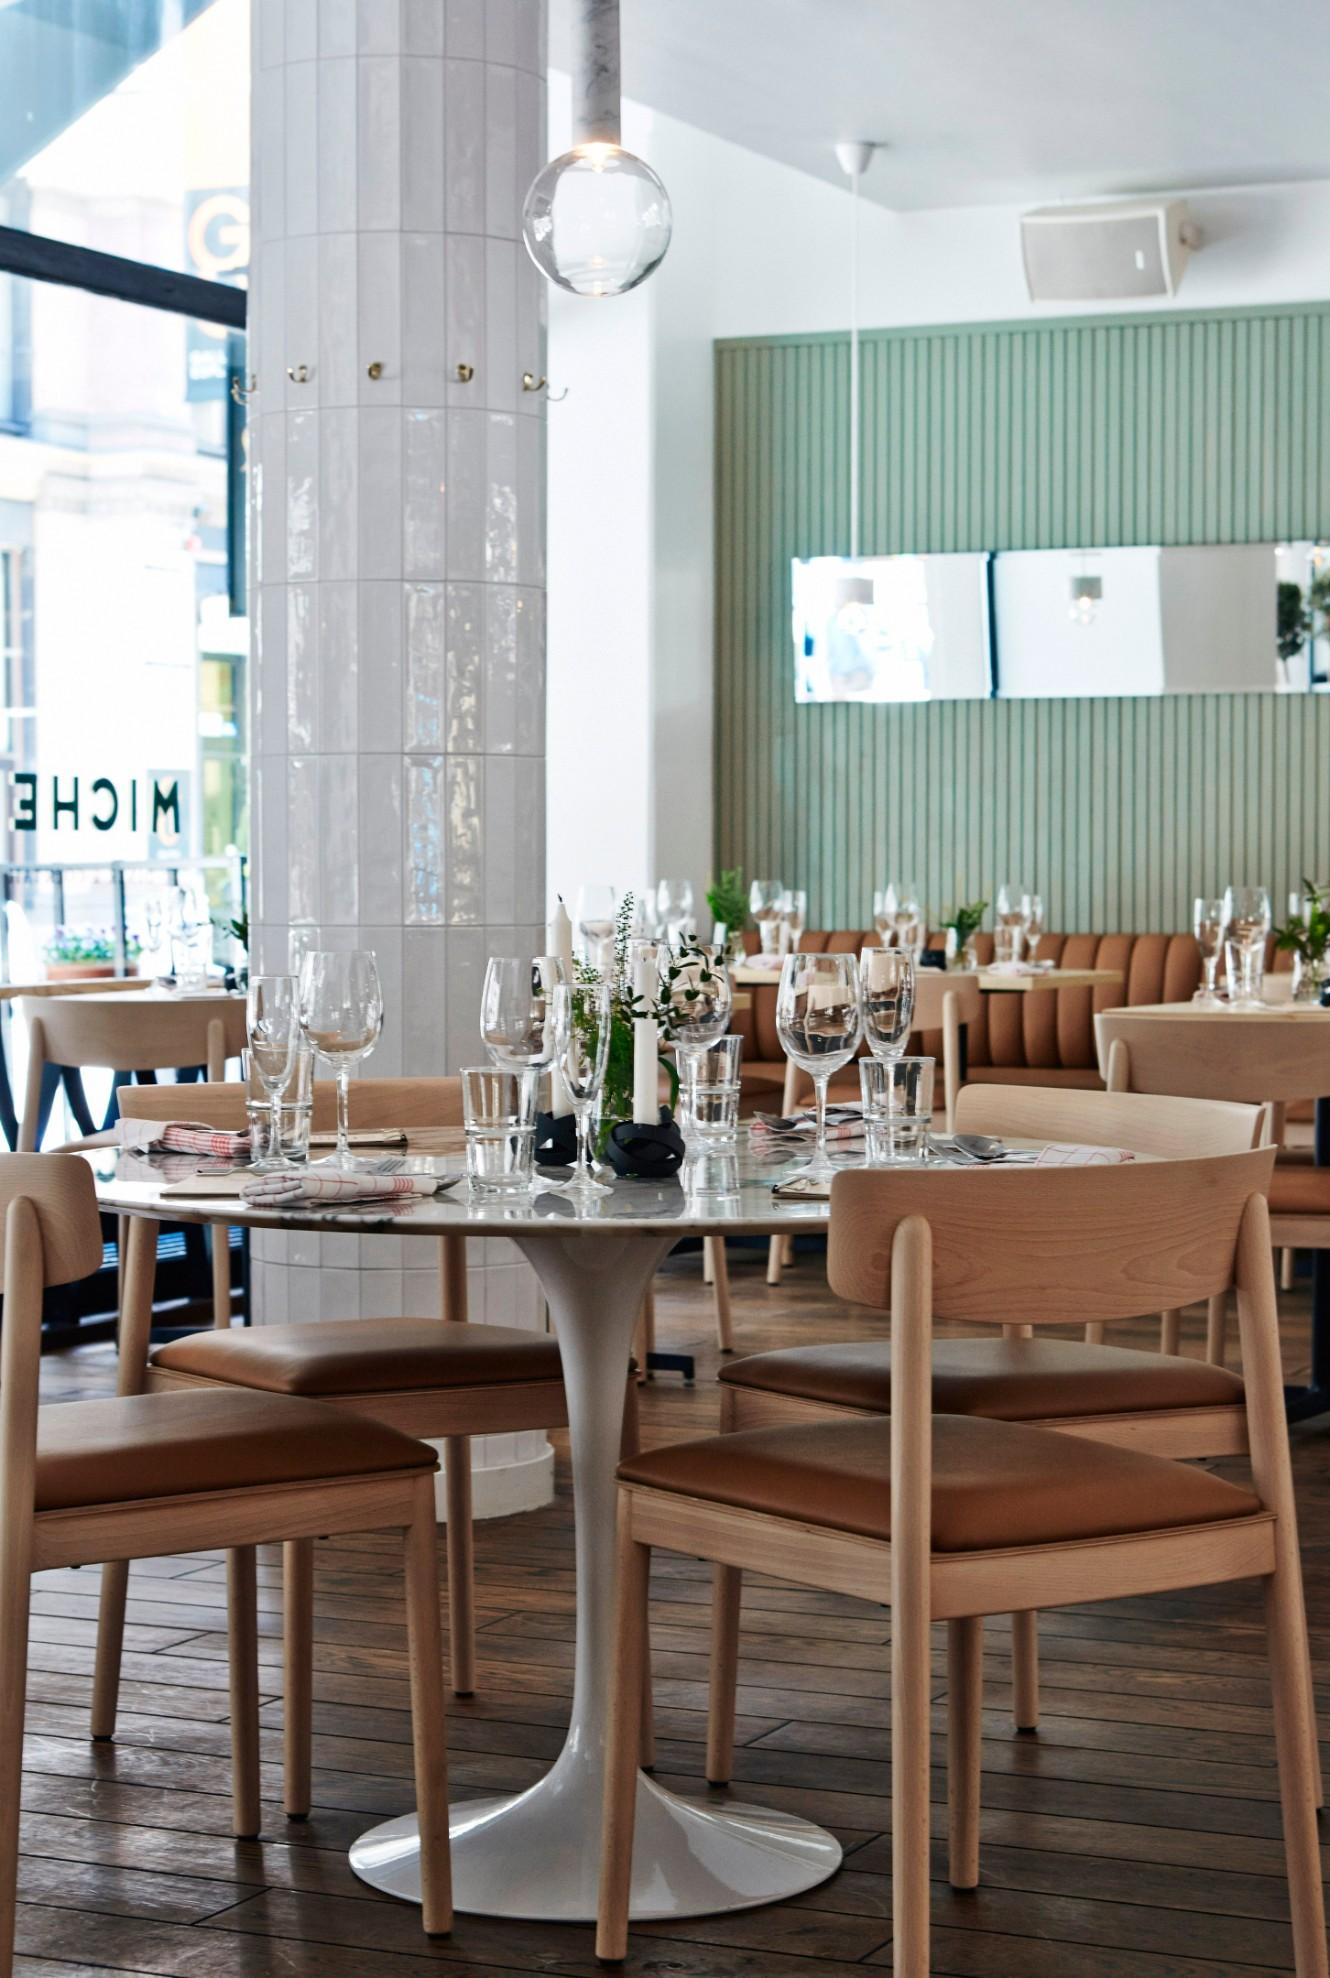 This luxury restaurant design is inspired by s kiosks